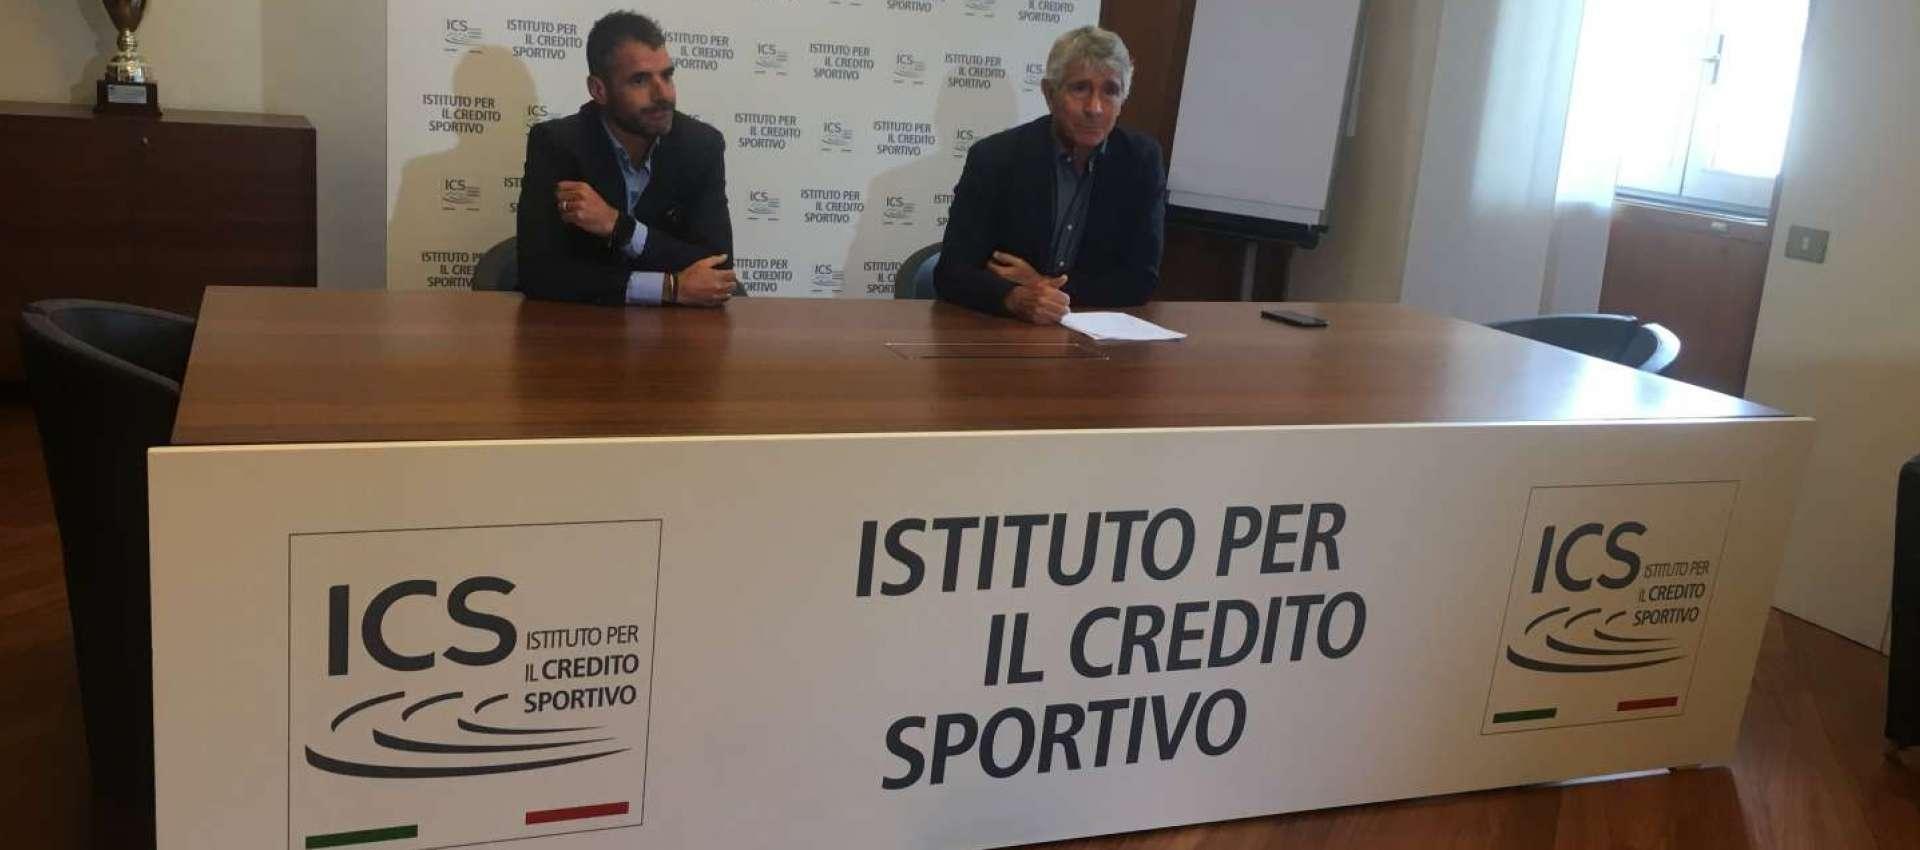 Simone Perrotta, Andrea Abodi, ICS, AIC, AIC Camp